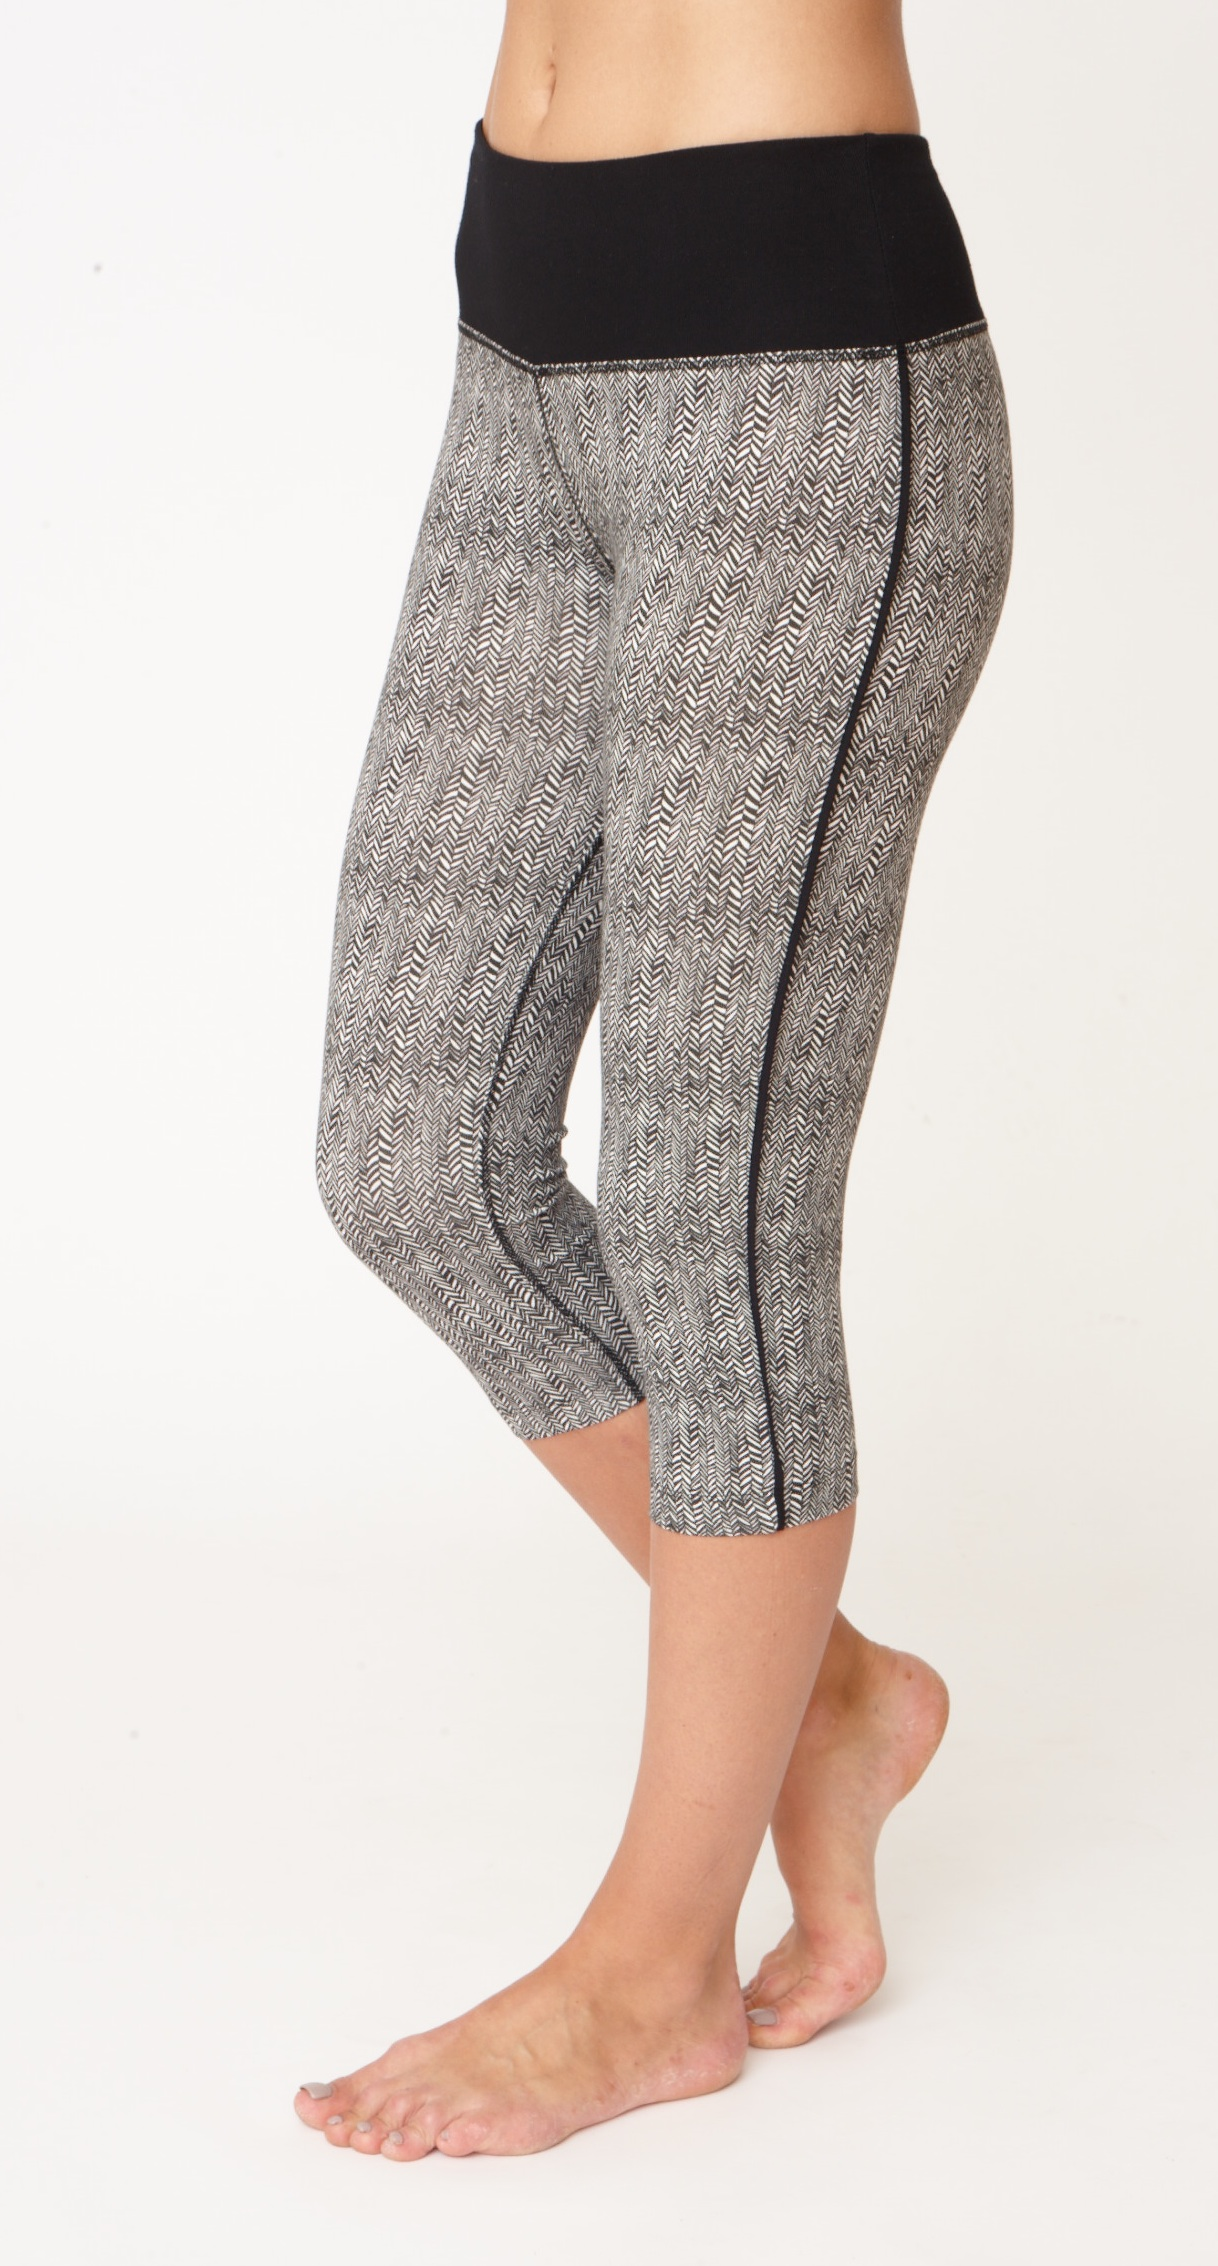 Asquith Karma Capri Yoga Leggings Herringbone with Jet Black Stripe